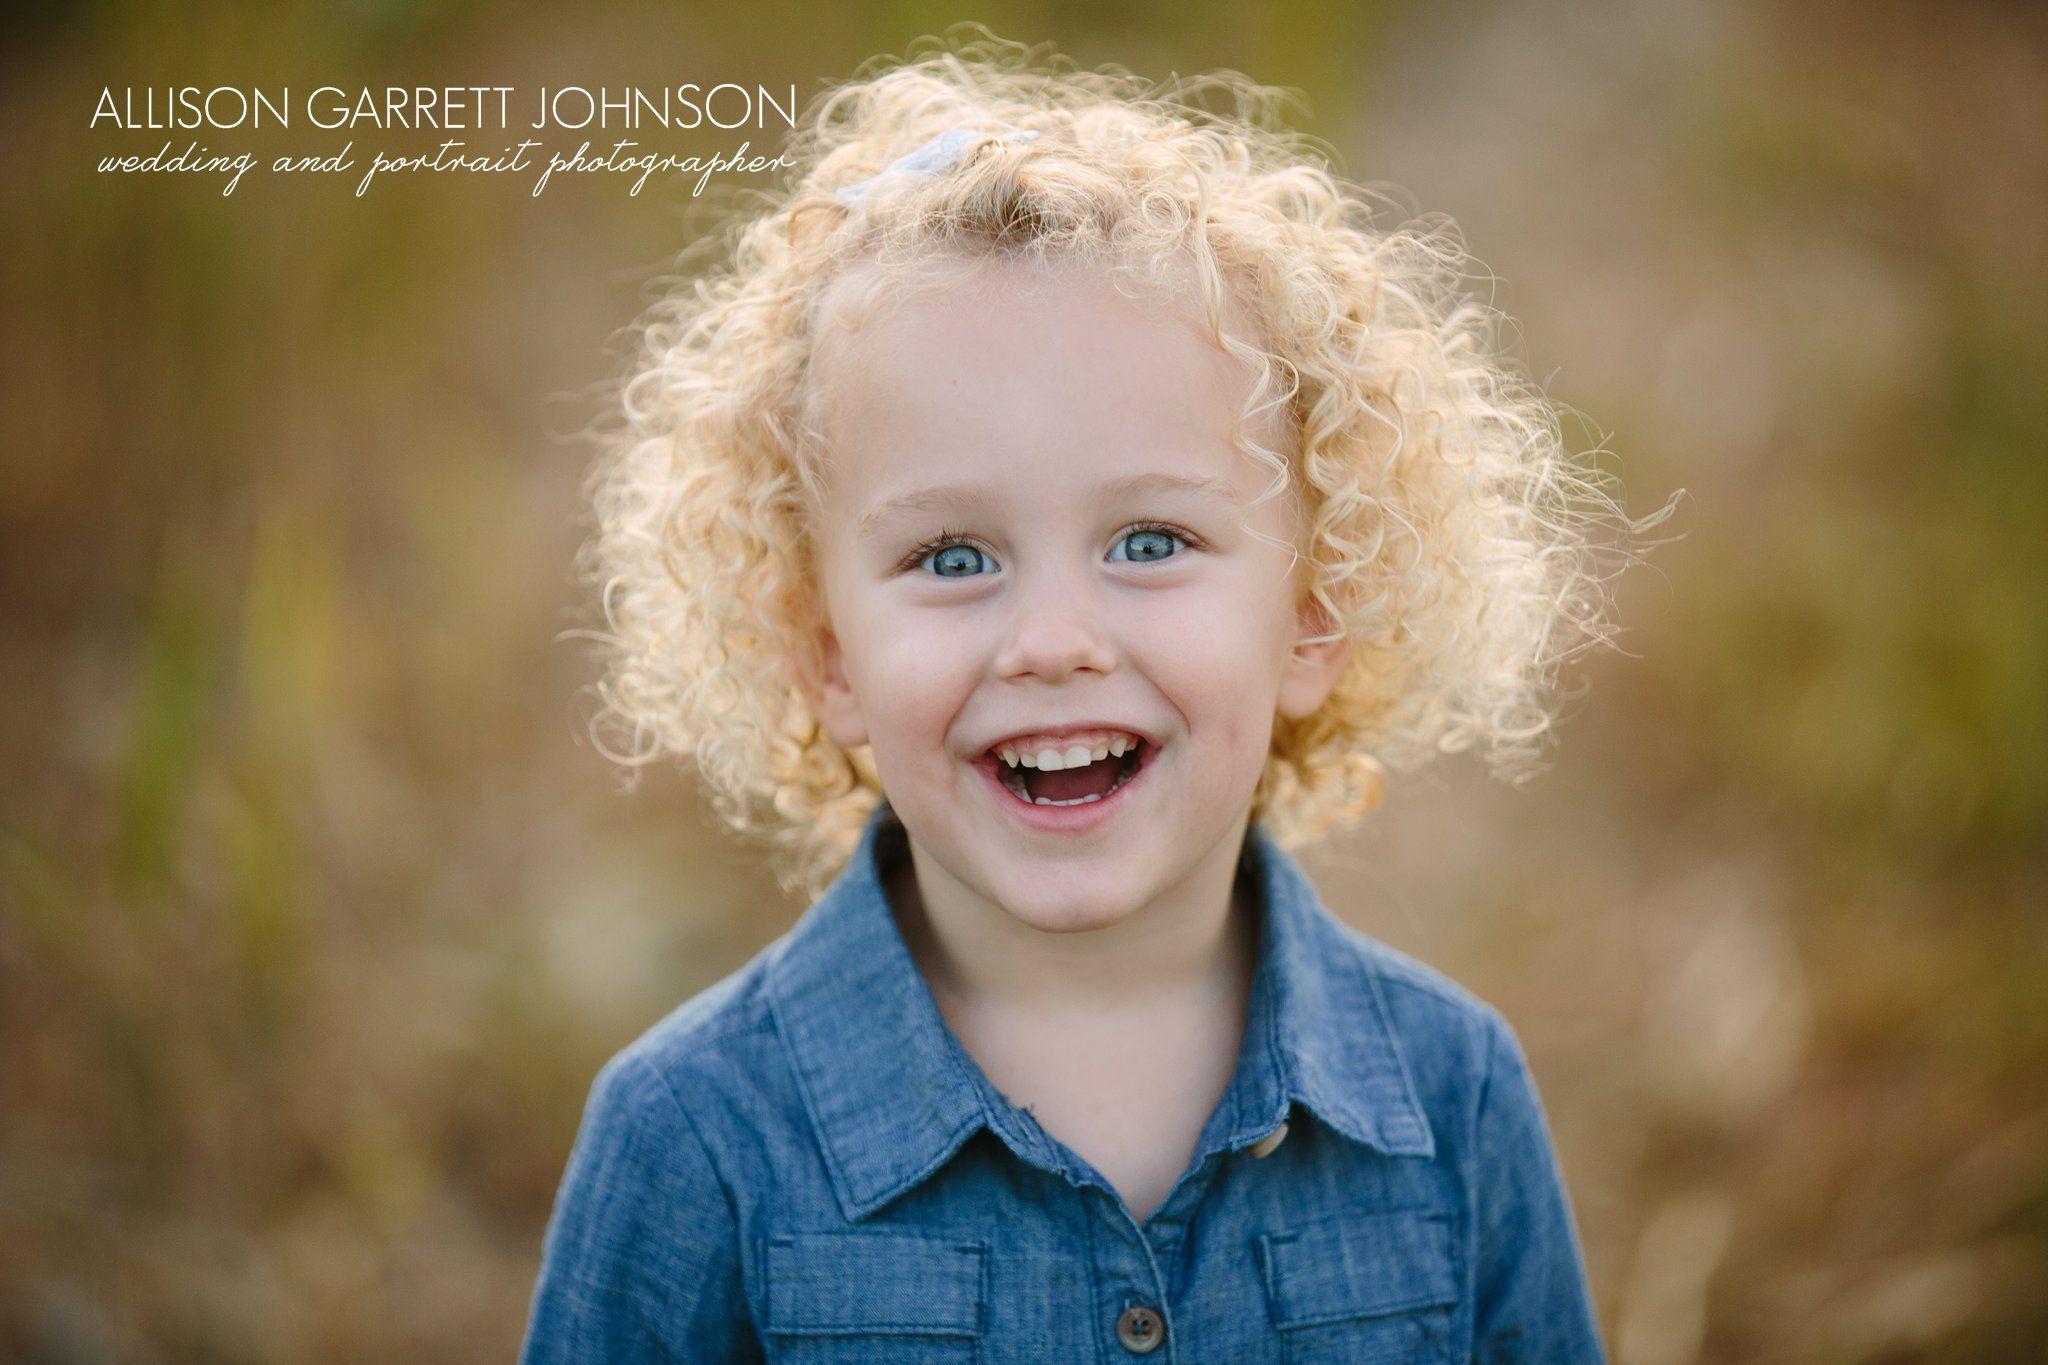 Just a favorite of my sweet niece, Kollyns.  #portrait  #familyportraitphotography #portraitphotography  #lnk  #kidphotography #childphotographer #familyphoto #nebraskaphotographer